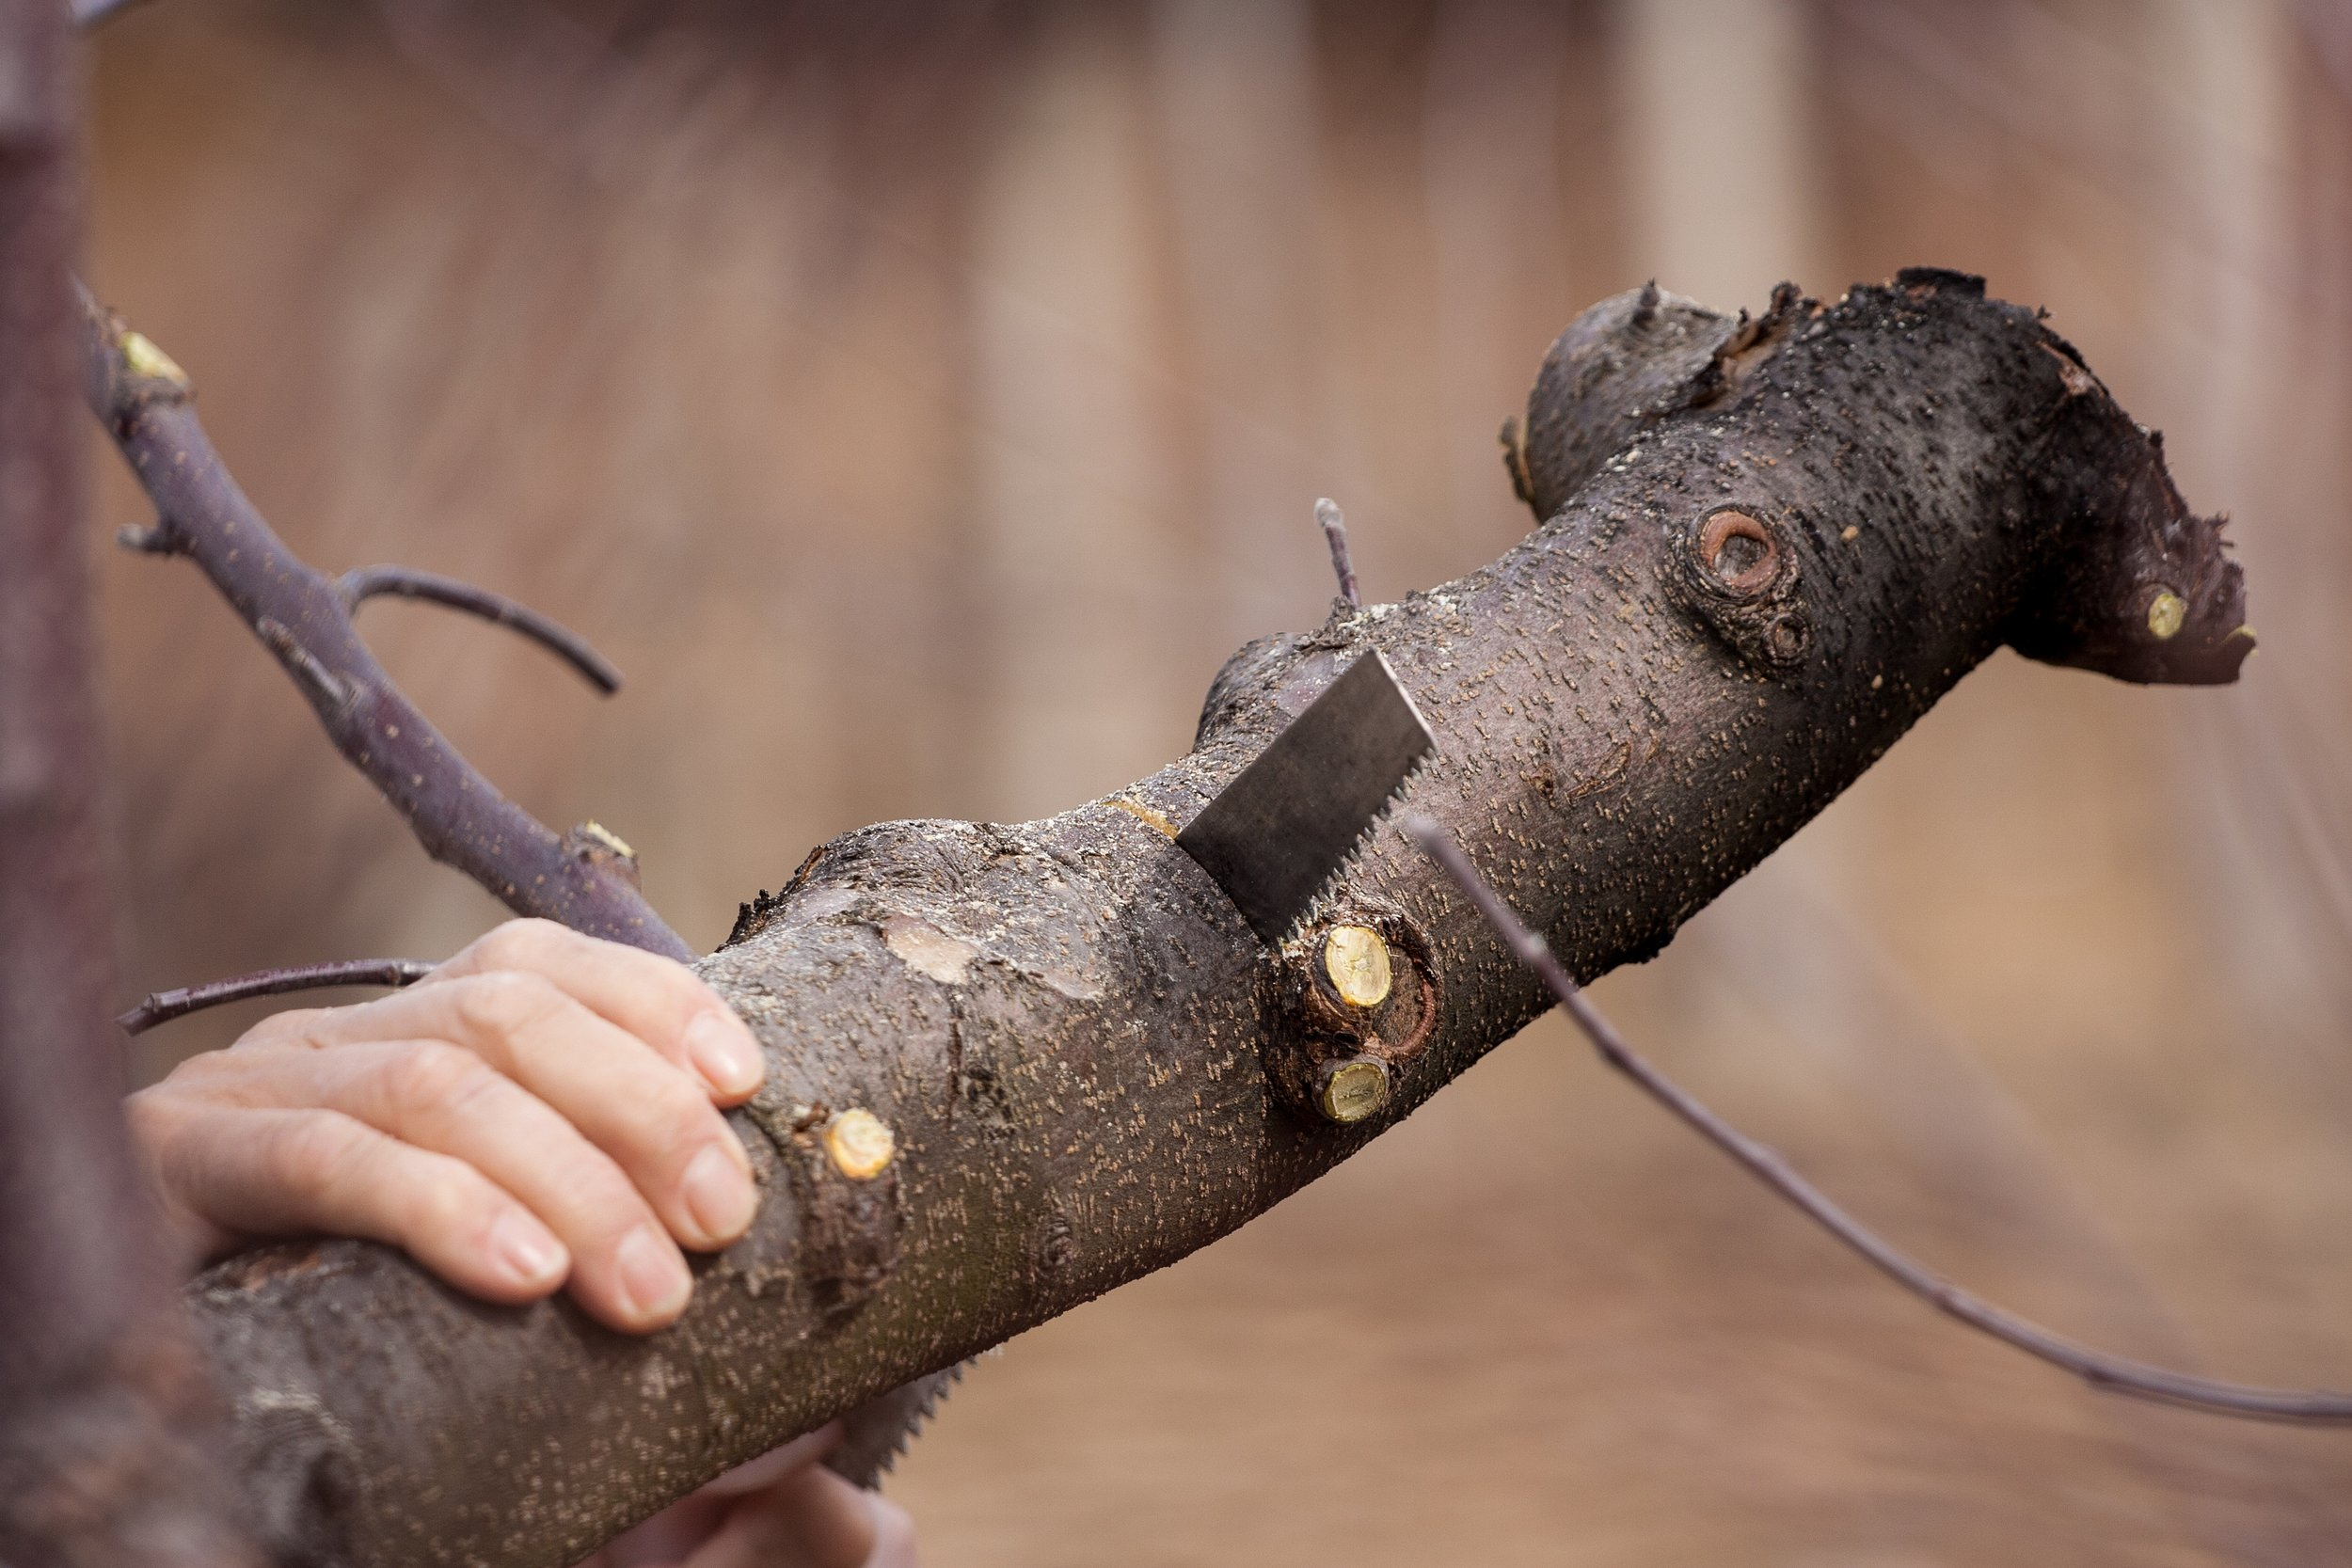 Black-cherry-tree-service-tree-trimming-pruning.jpg